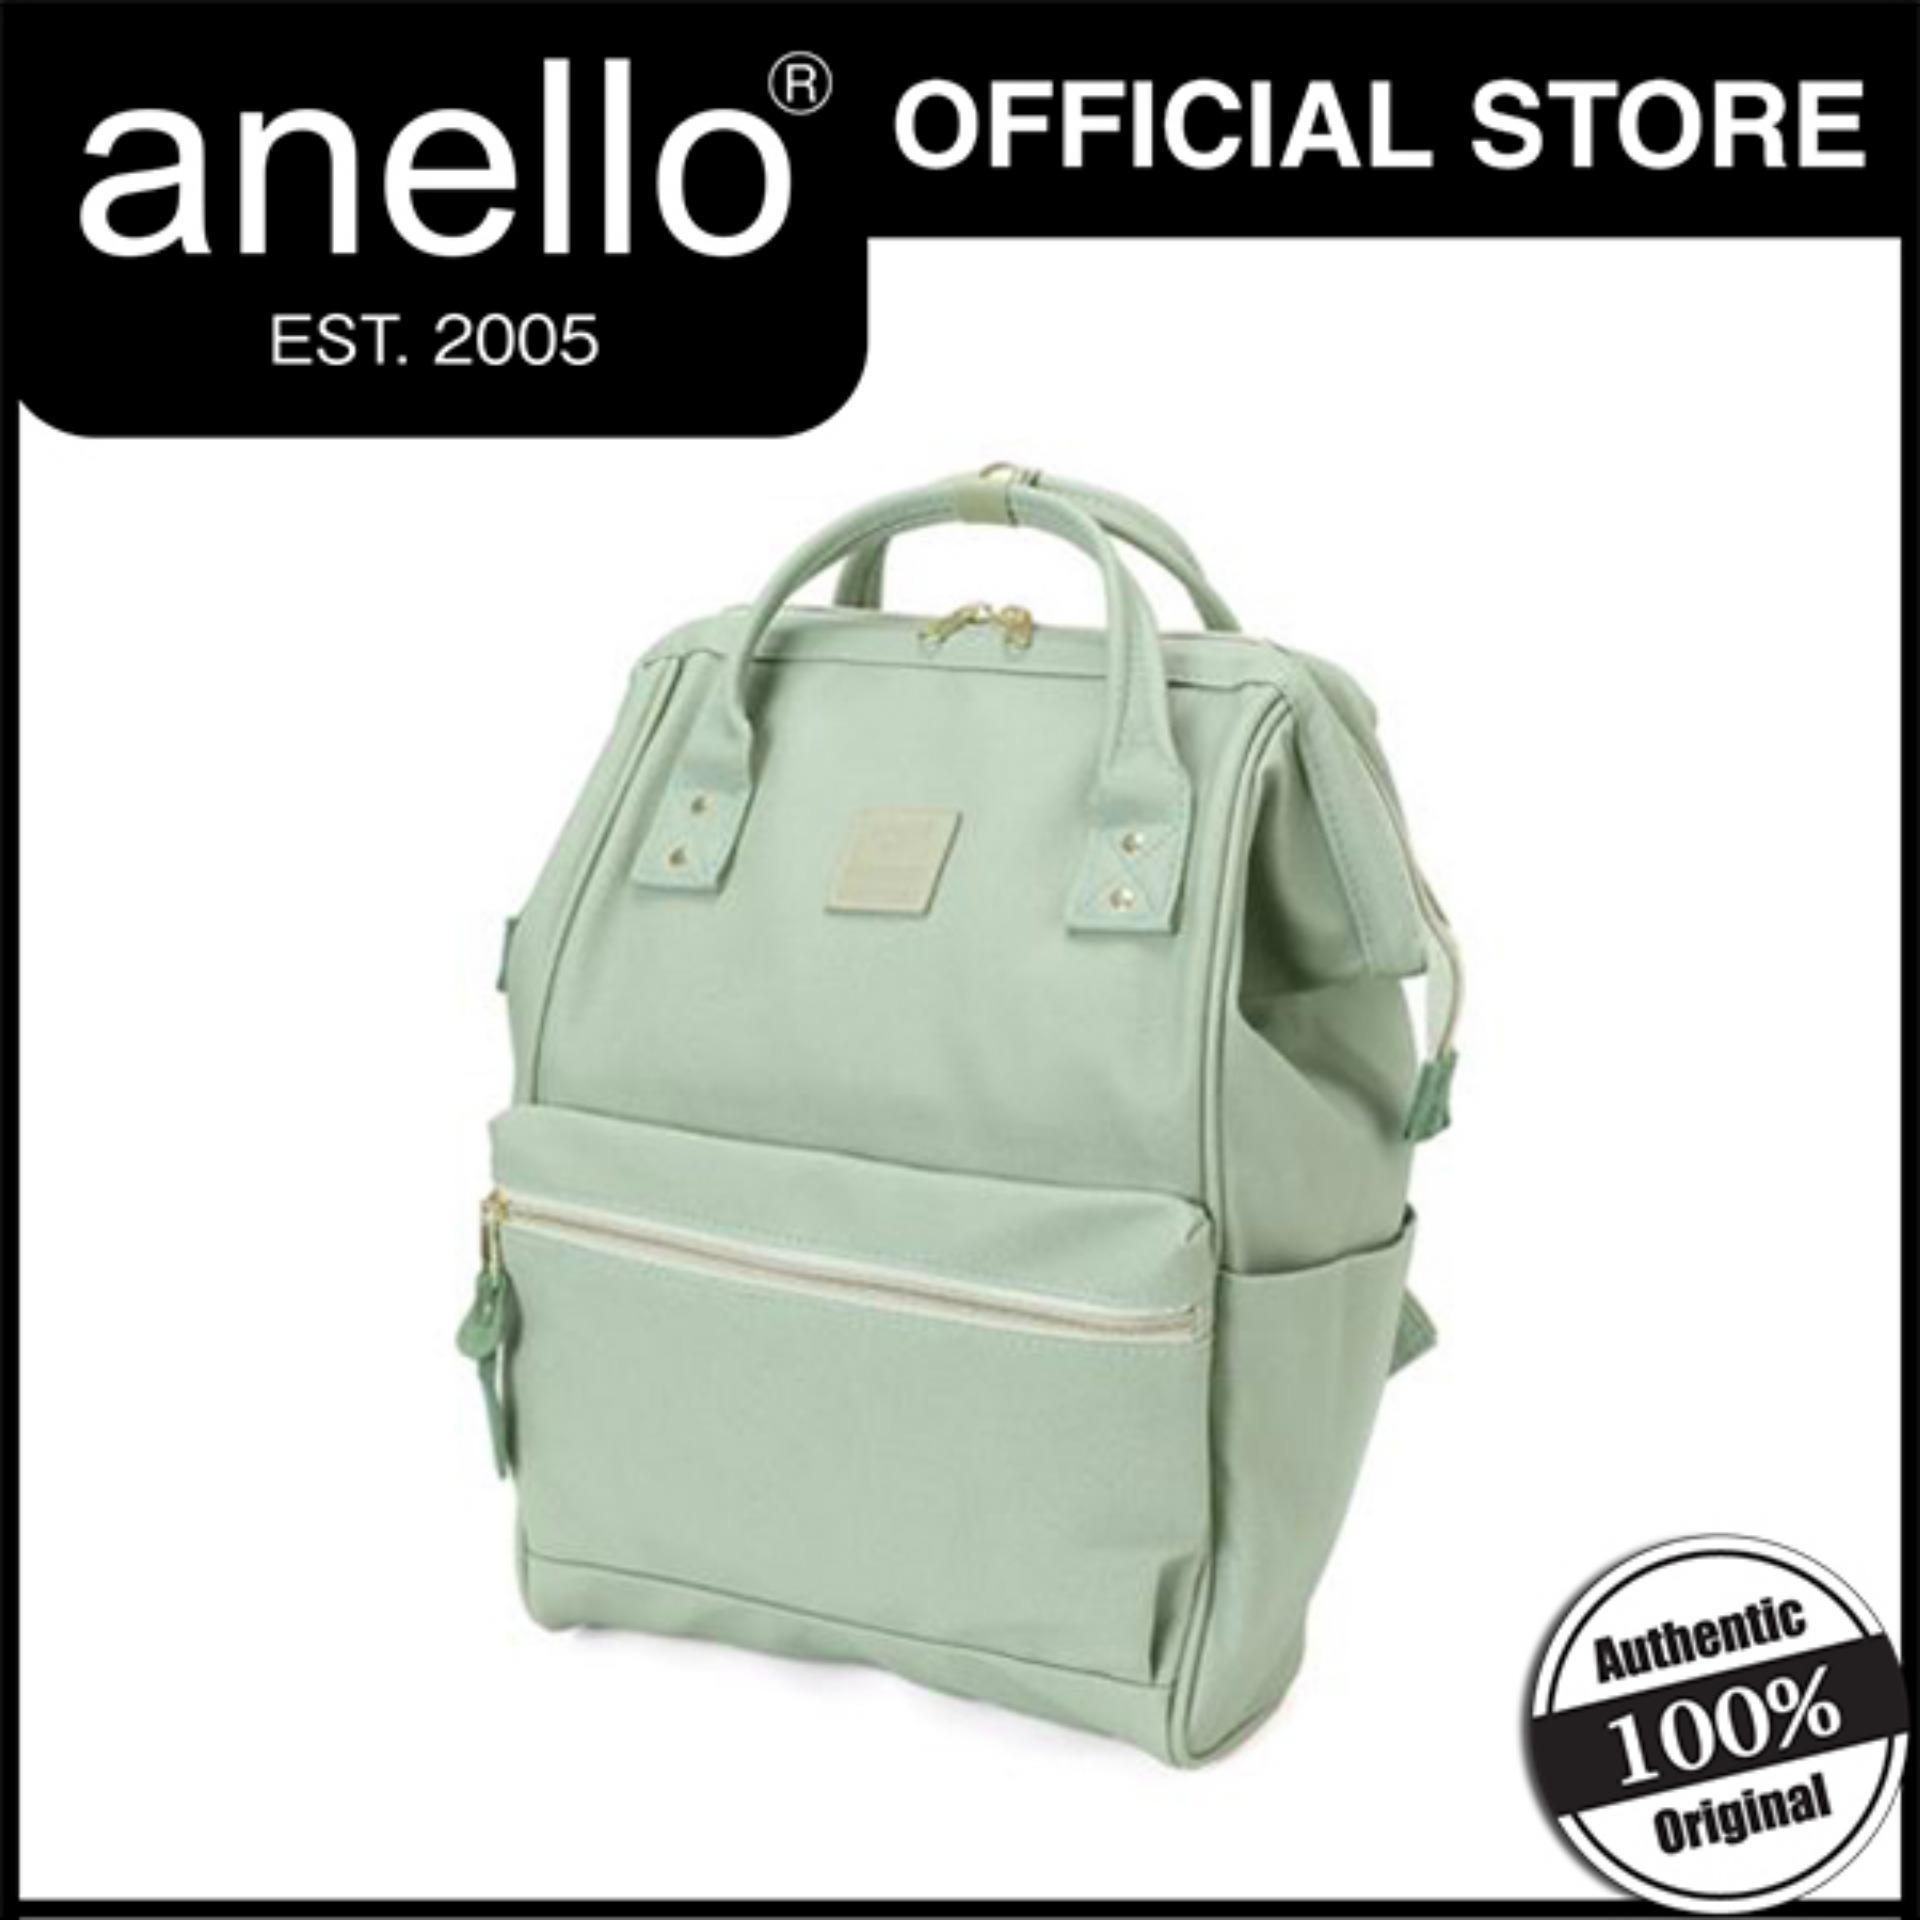 f76e6571f72 Latest anello Unisex Backpacks Products | Enjoy Huge Discounts ...